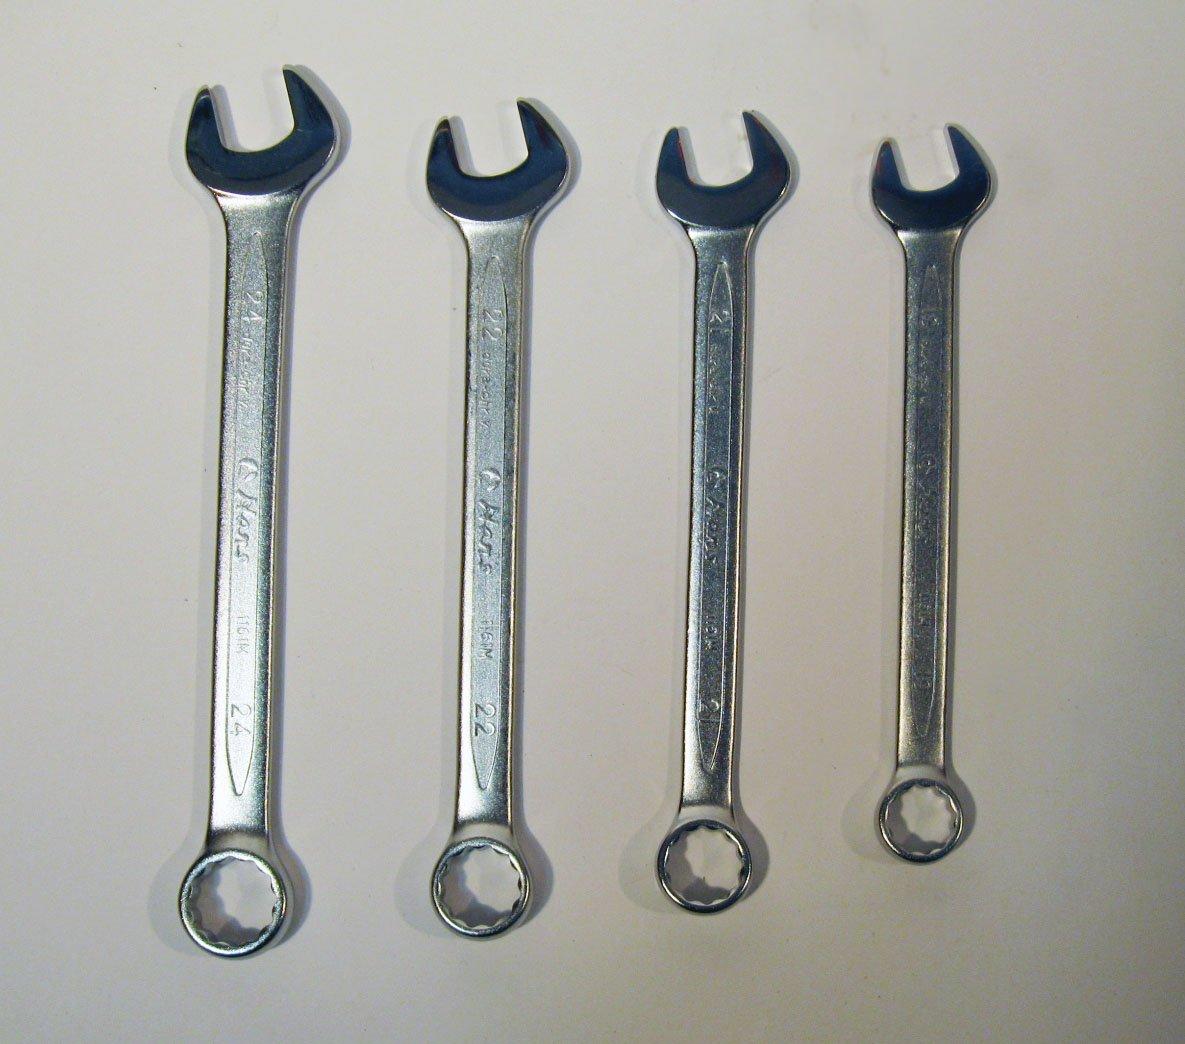 Трубчатые ключи своими руками